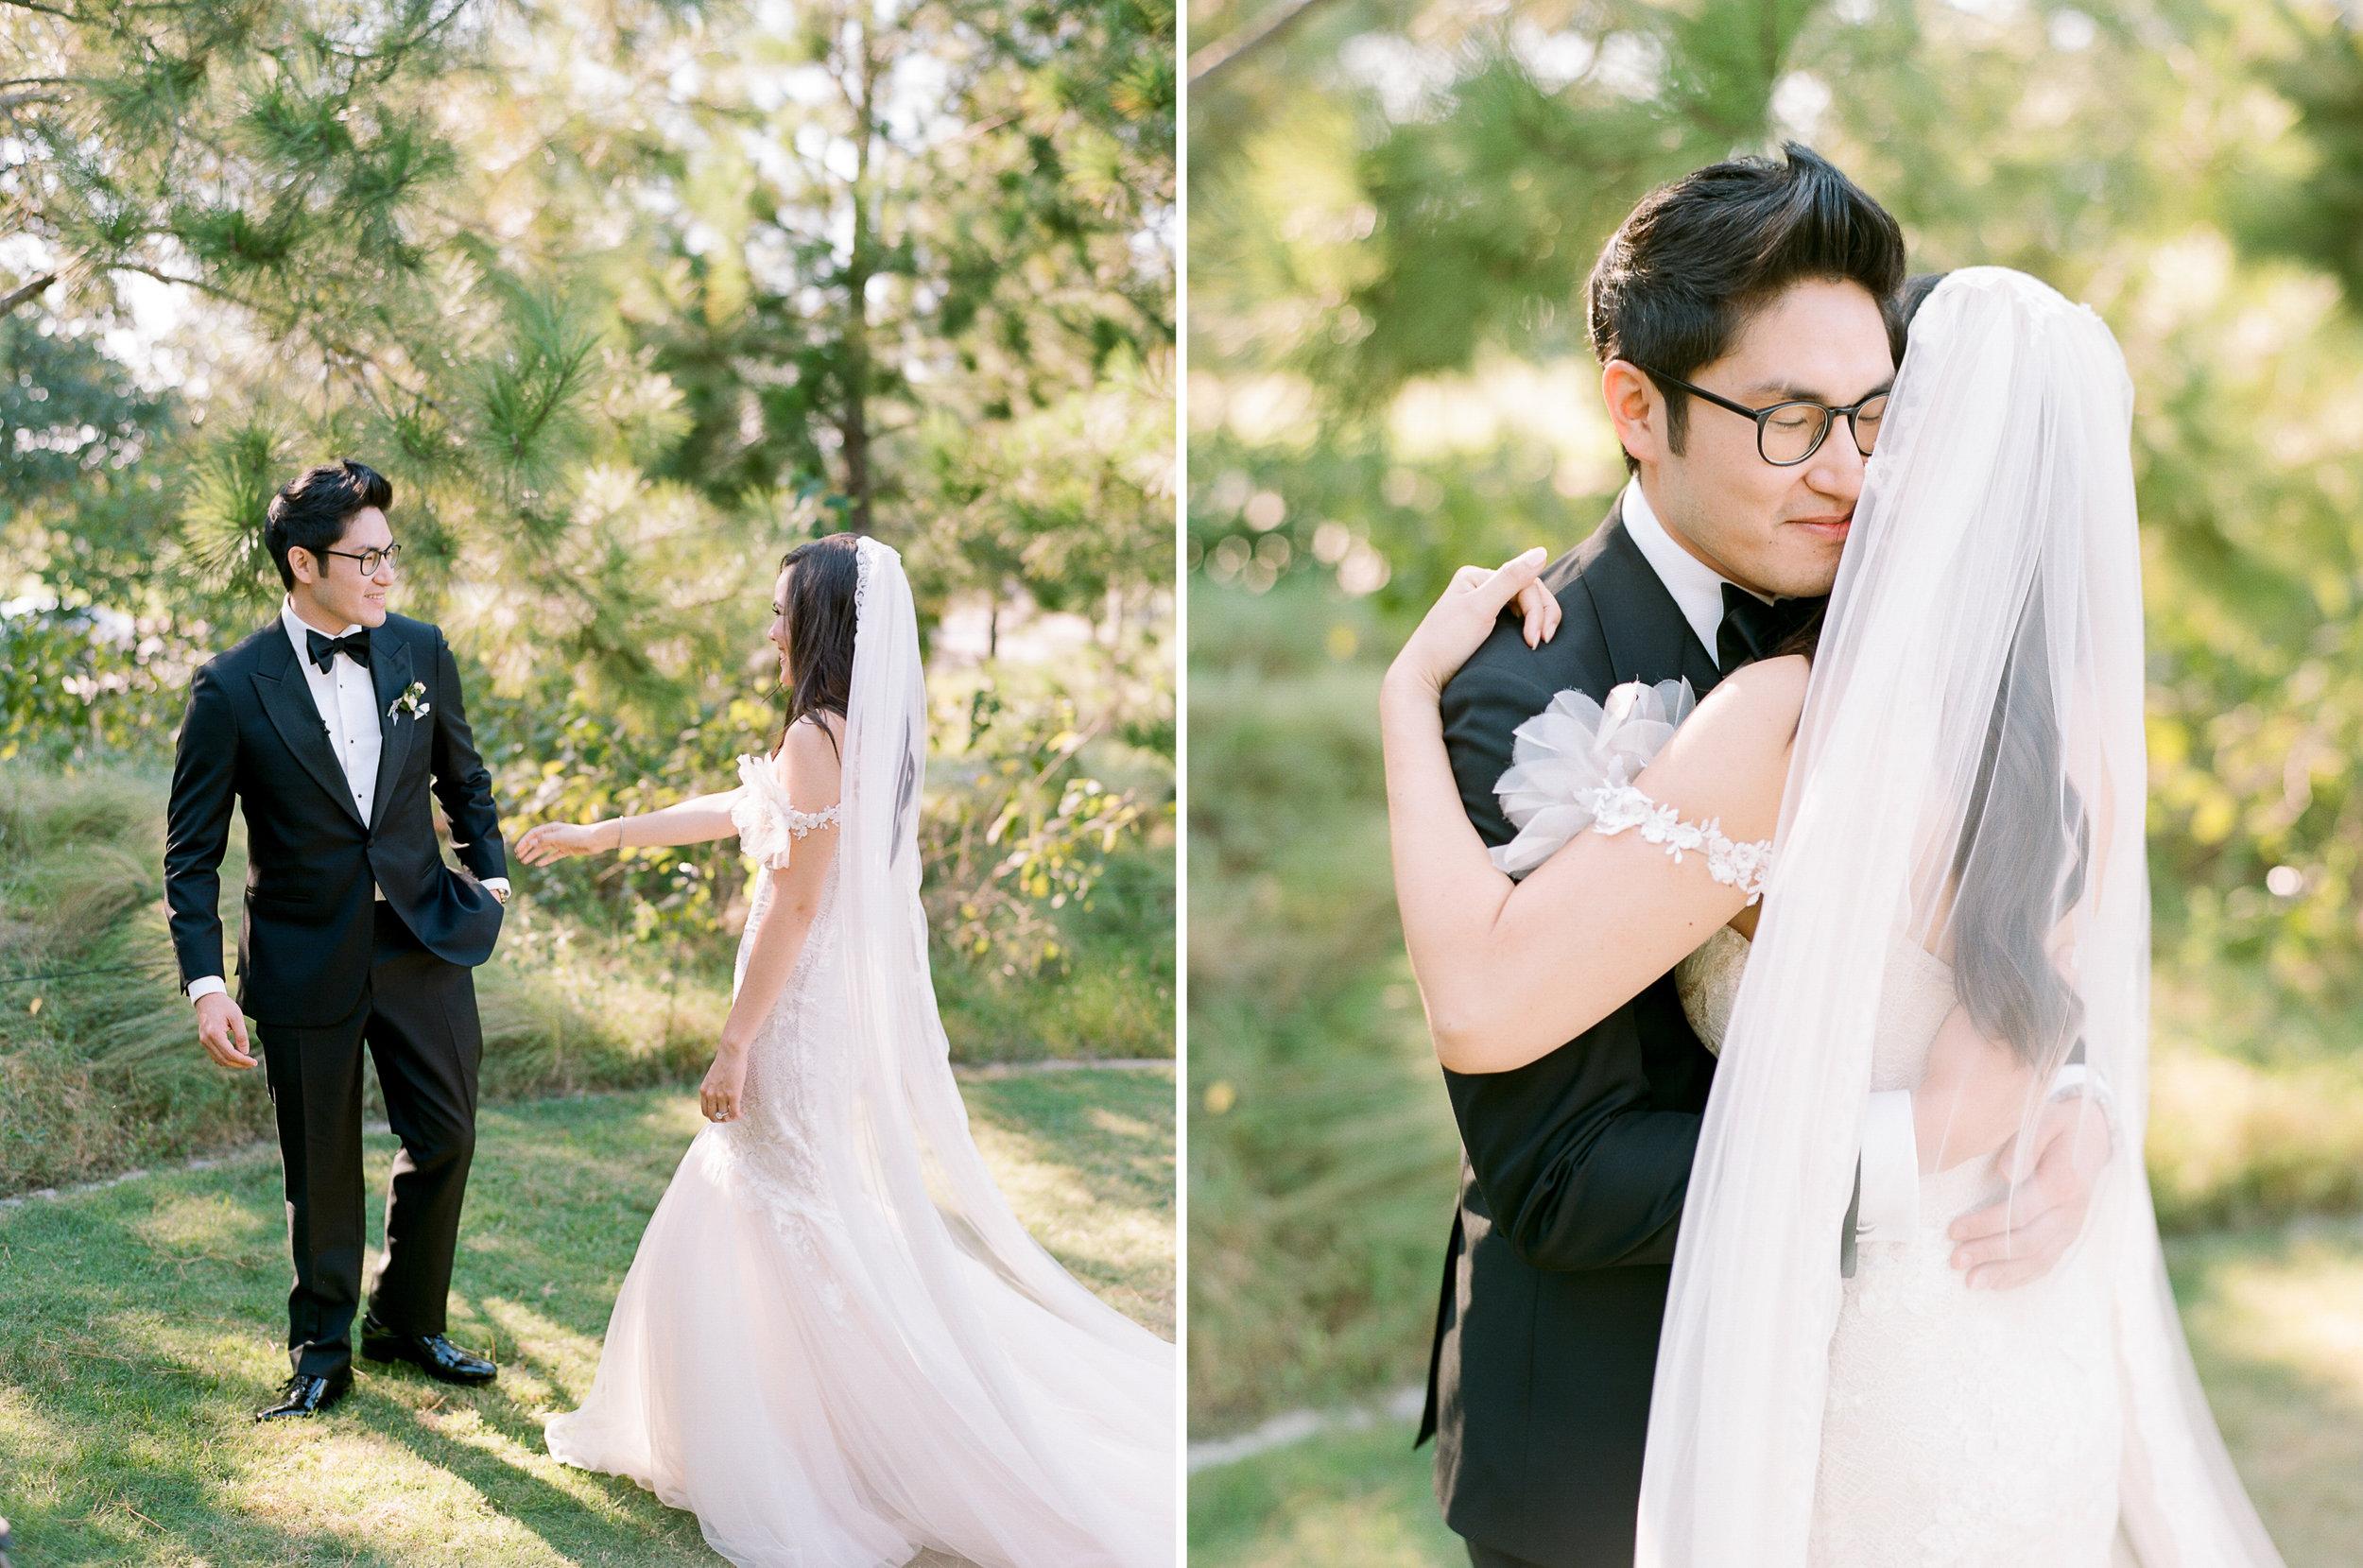 Martha-Stewart-Wedding-Dana-Fernandez-Photography-Josh-Texas-Film-Houston-Wedding-Fine-Art-Photographer-McGovern-Centennial-Gardens-Top-Best-110.jpg